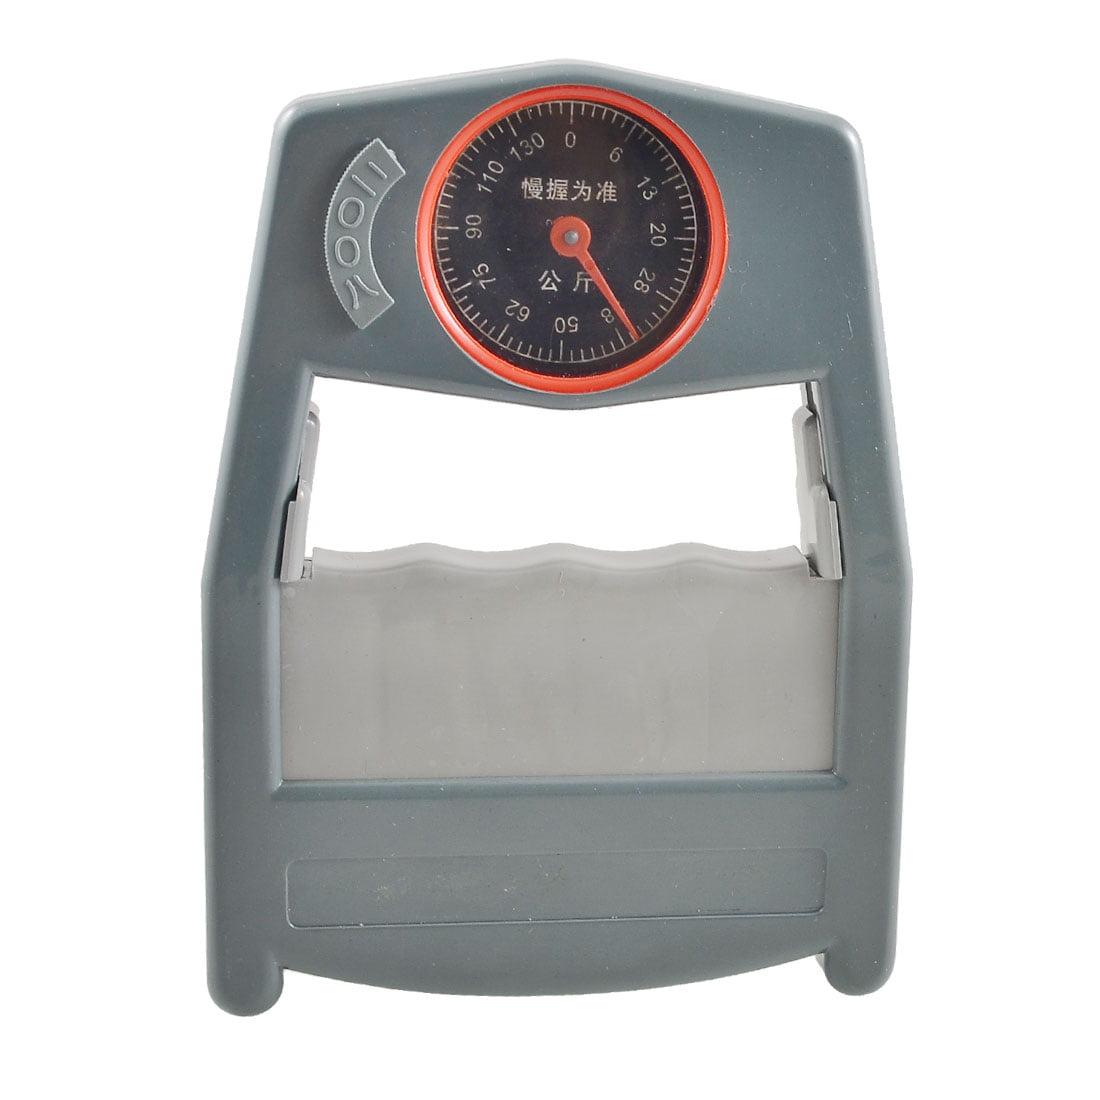 Plastic Gray Handle Handgrip Strength Dynamometer 0-130Kg Measurement